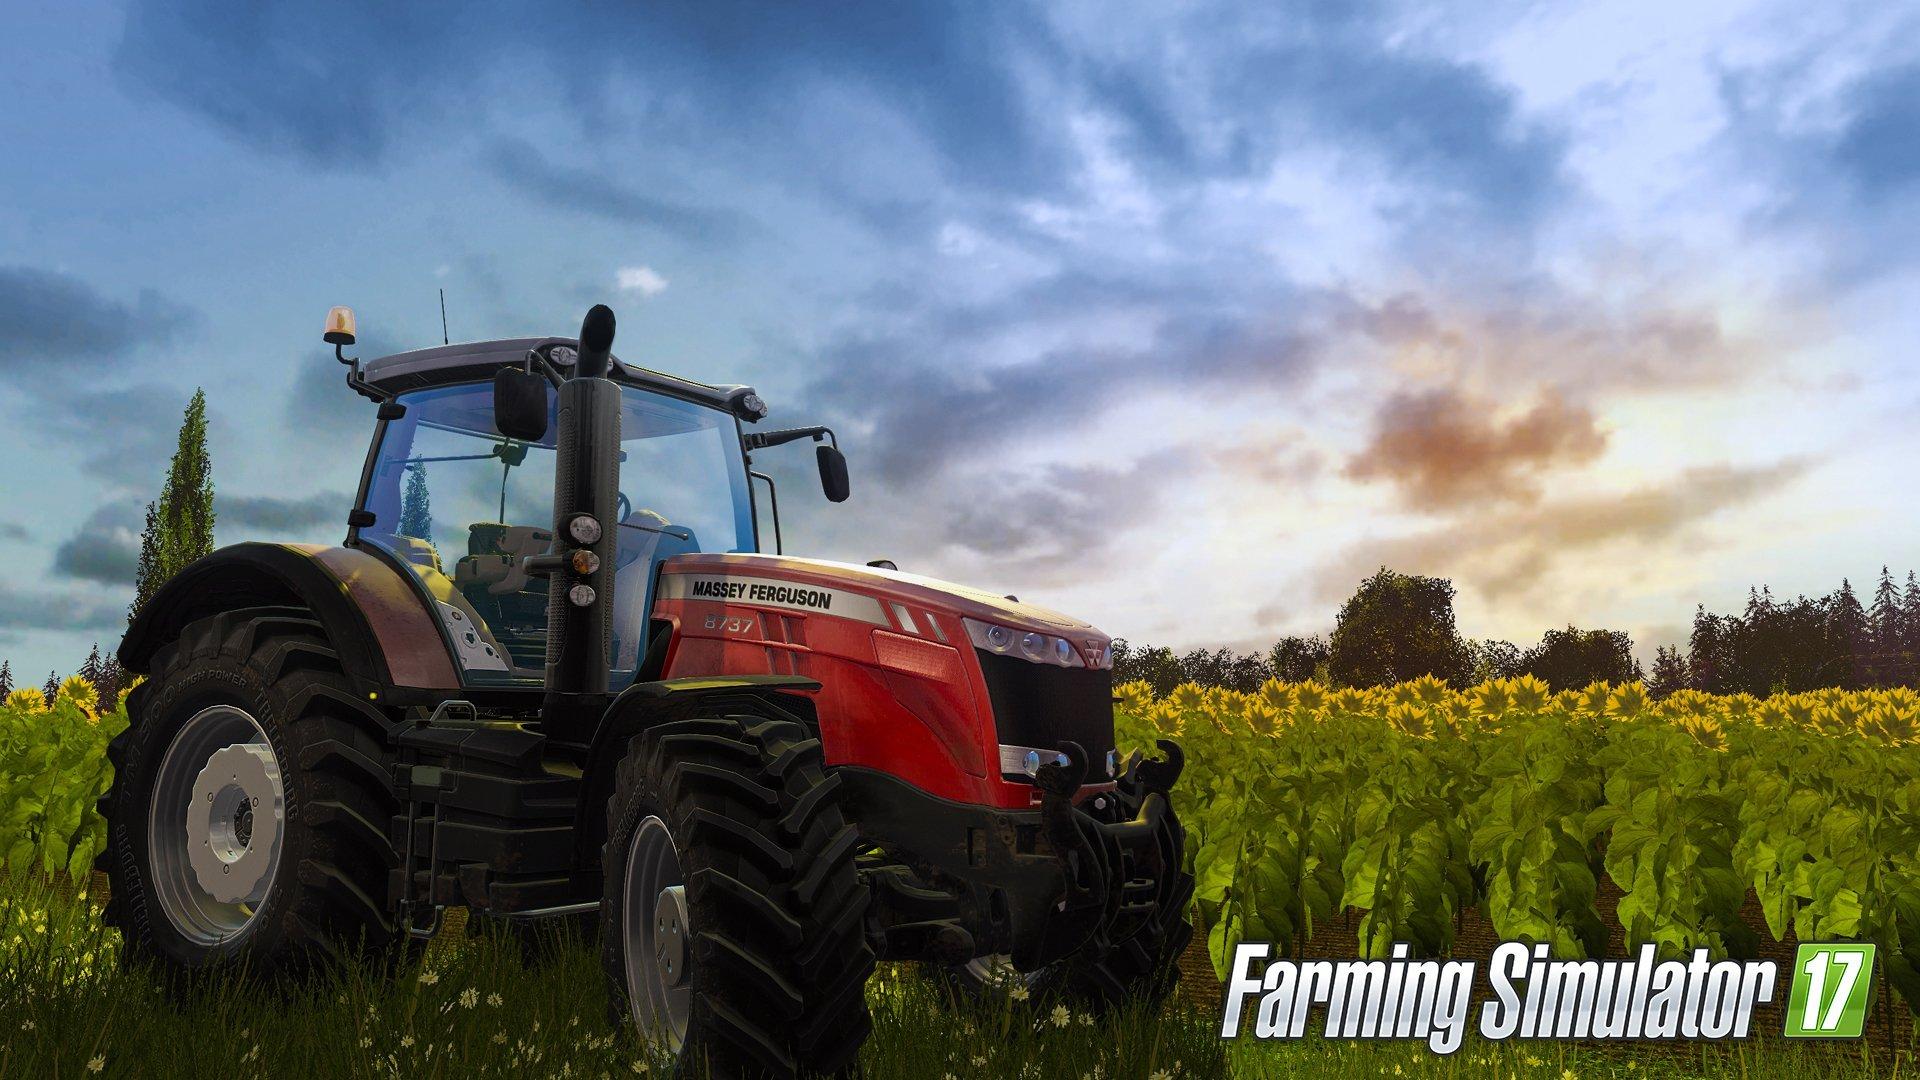 На Е3 анонсировали Farming Simulator 17!!! - Изображение 1